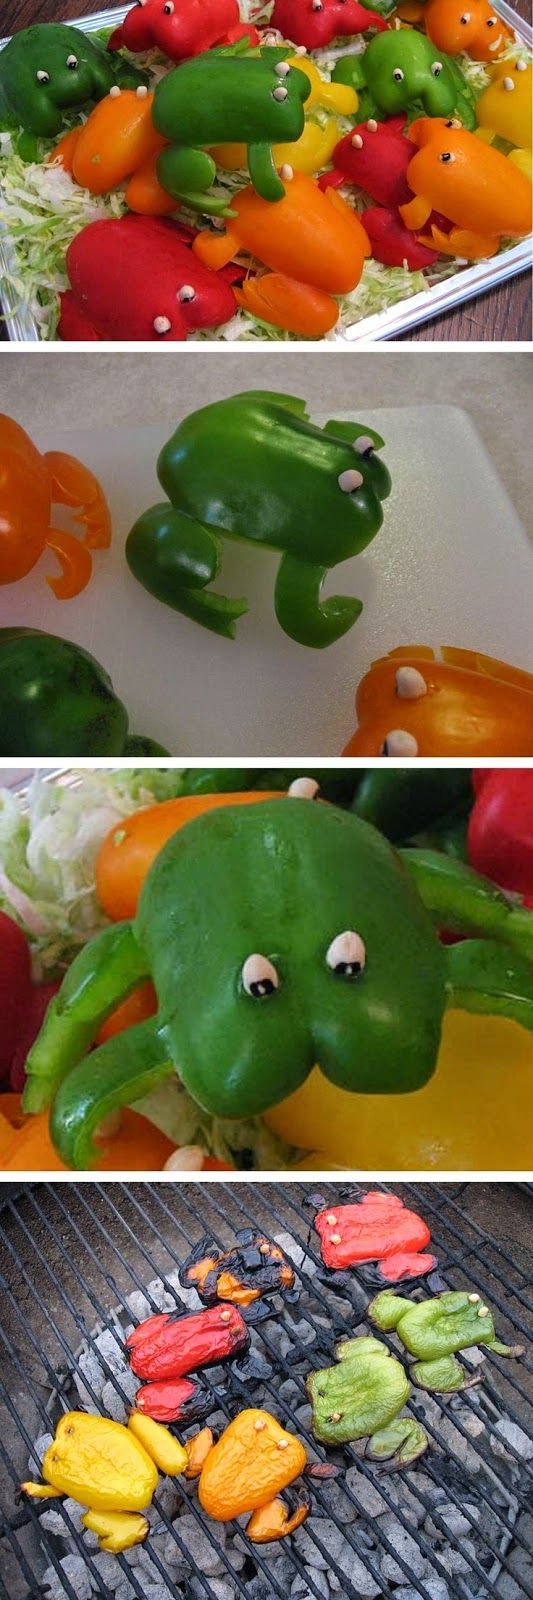 Paprika kikkers